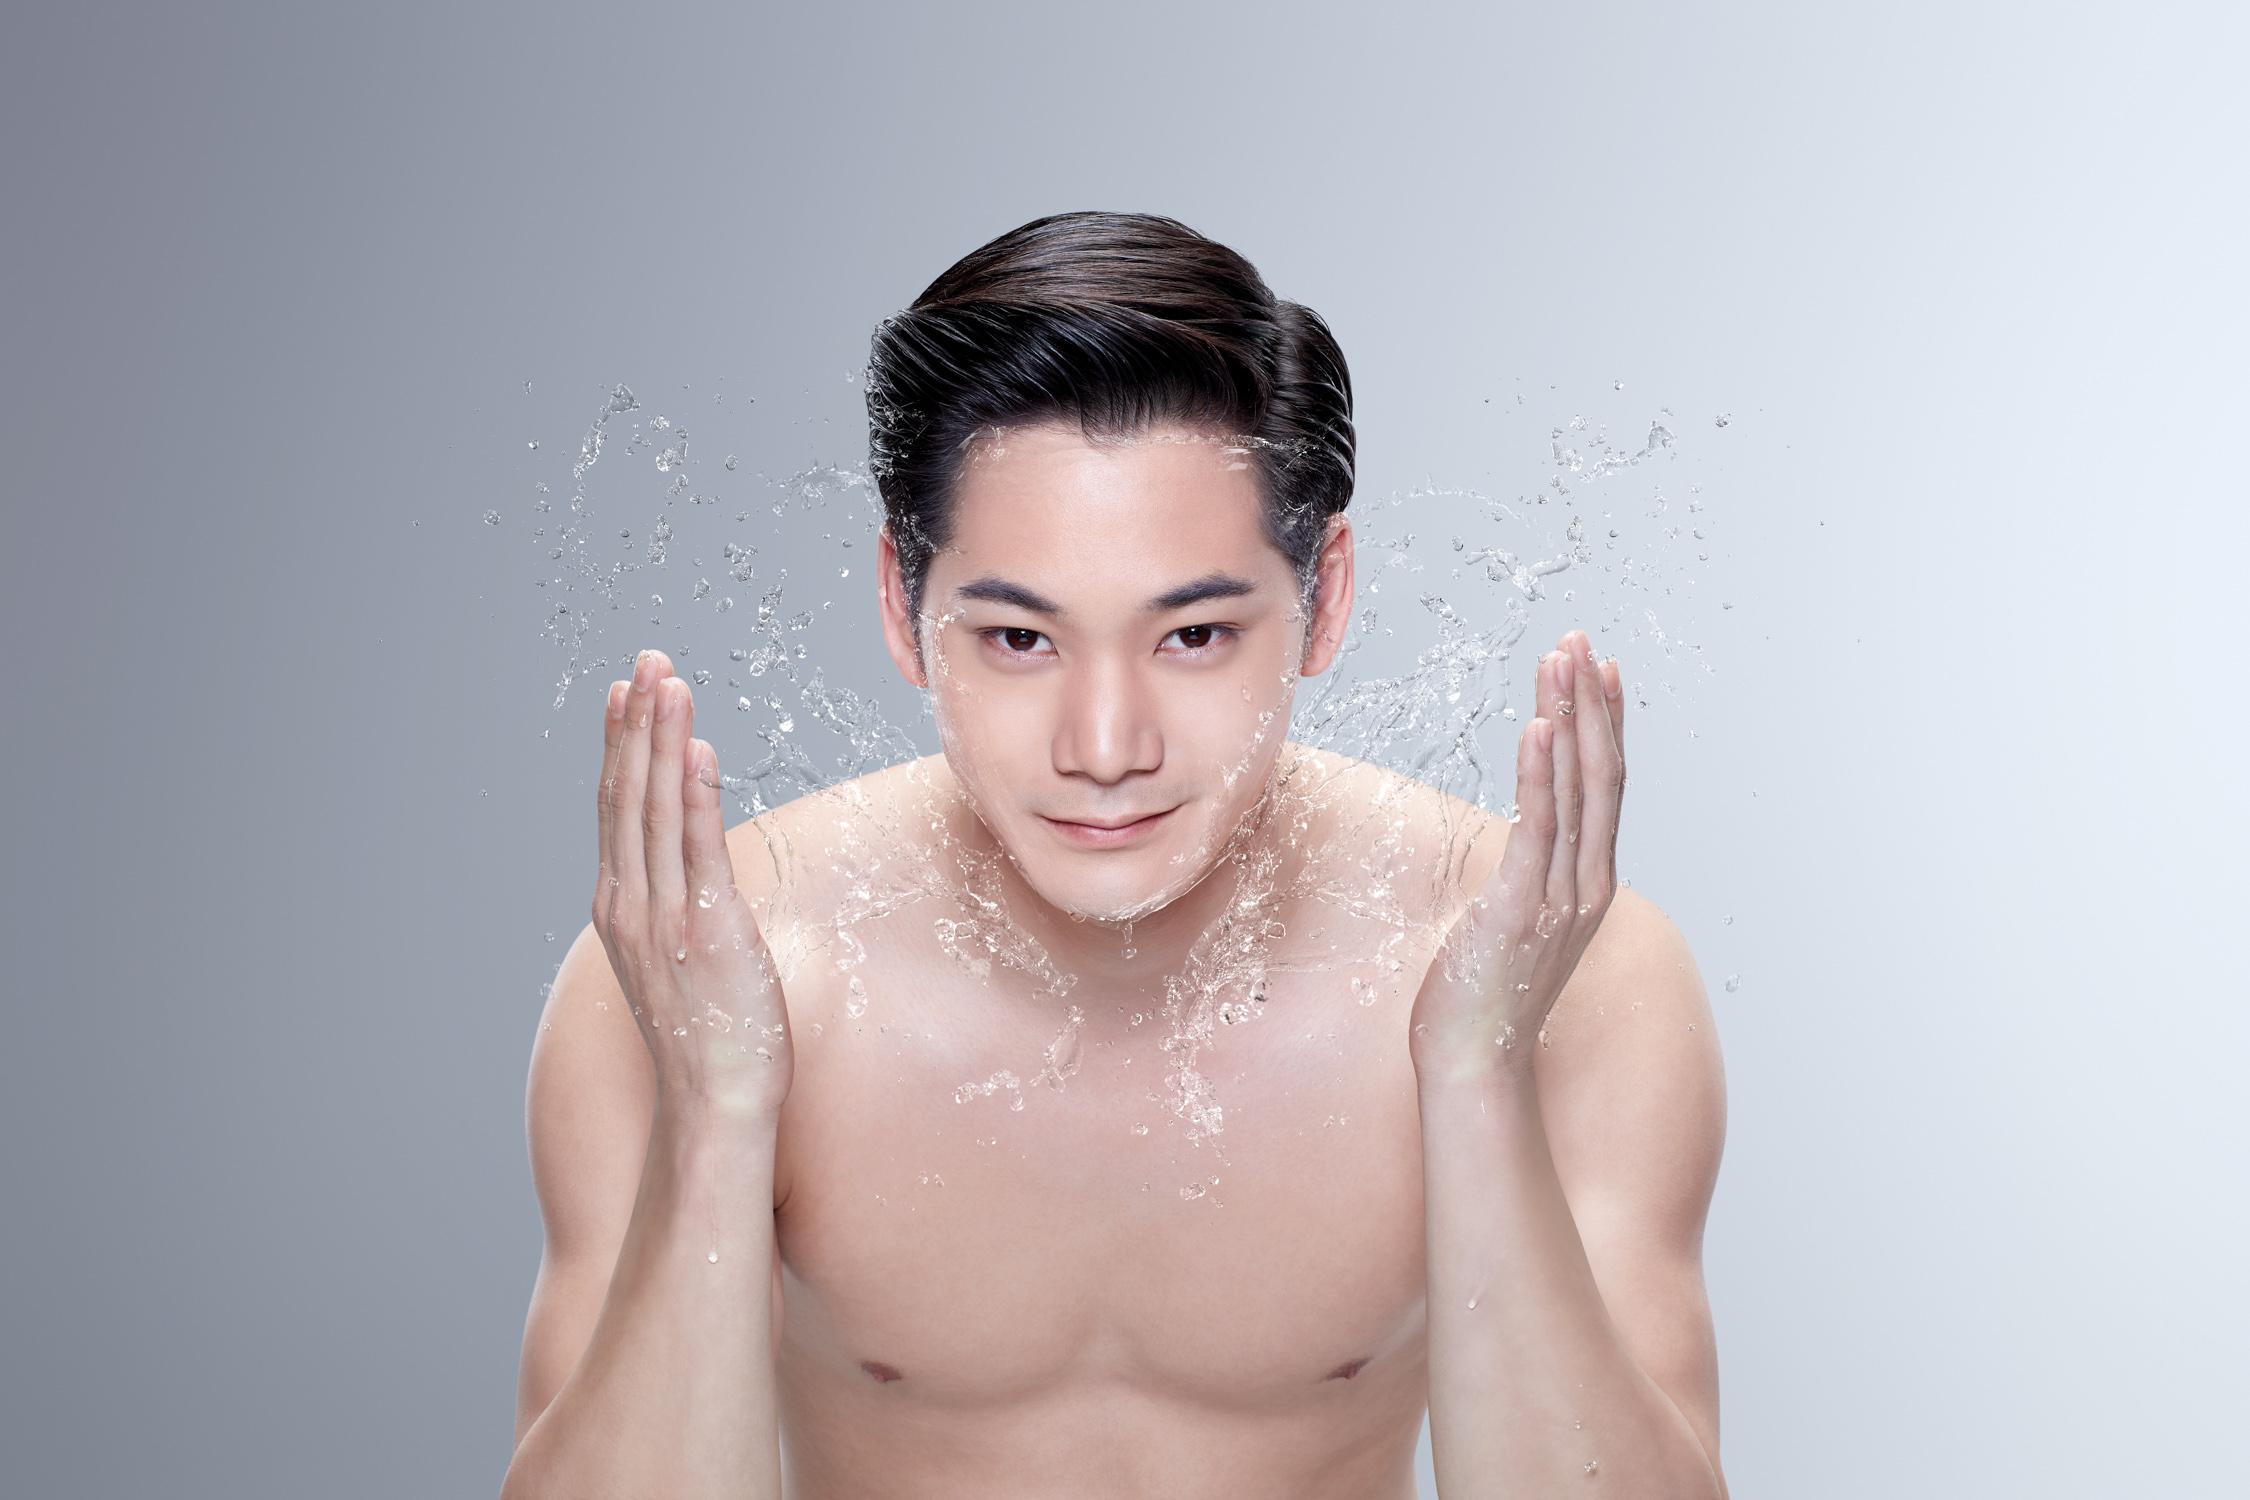 GATSBY Facial Wash